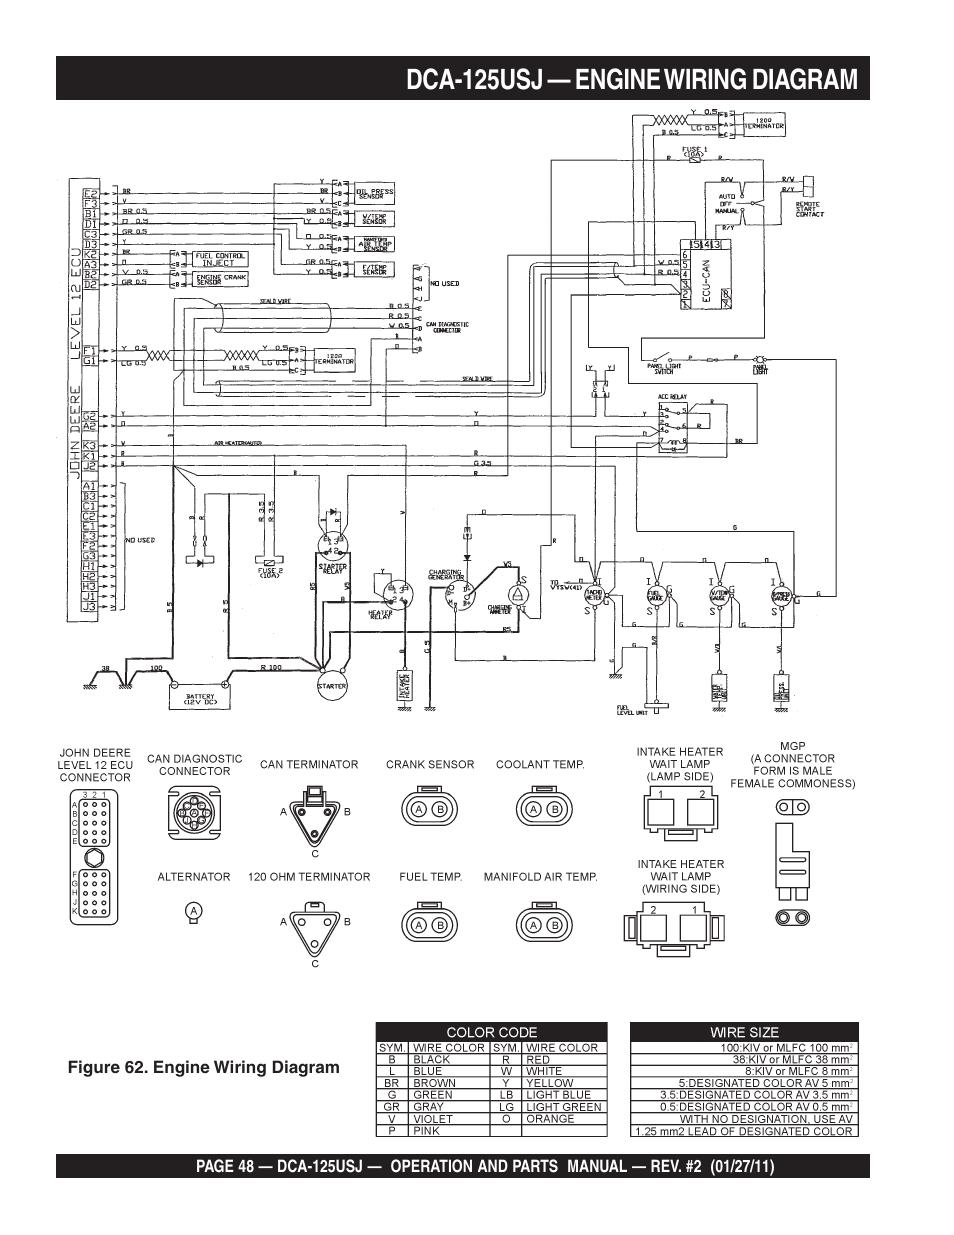 medium resolution of dca 125usj engine wiring diagram multiquip mq power 60 hz generator dca125usj user manual page 48 84